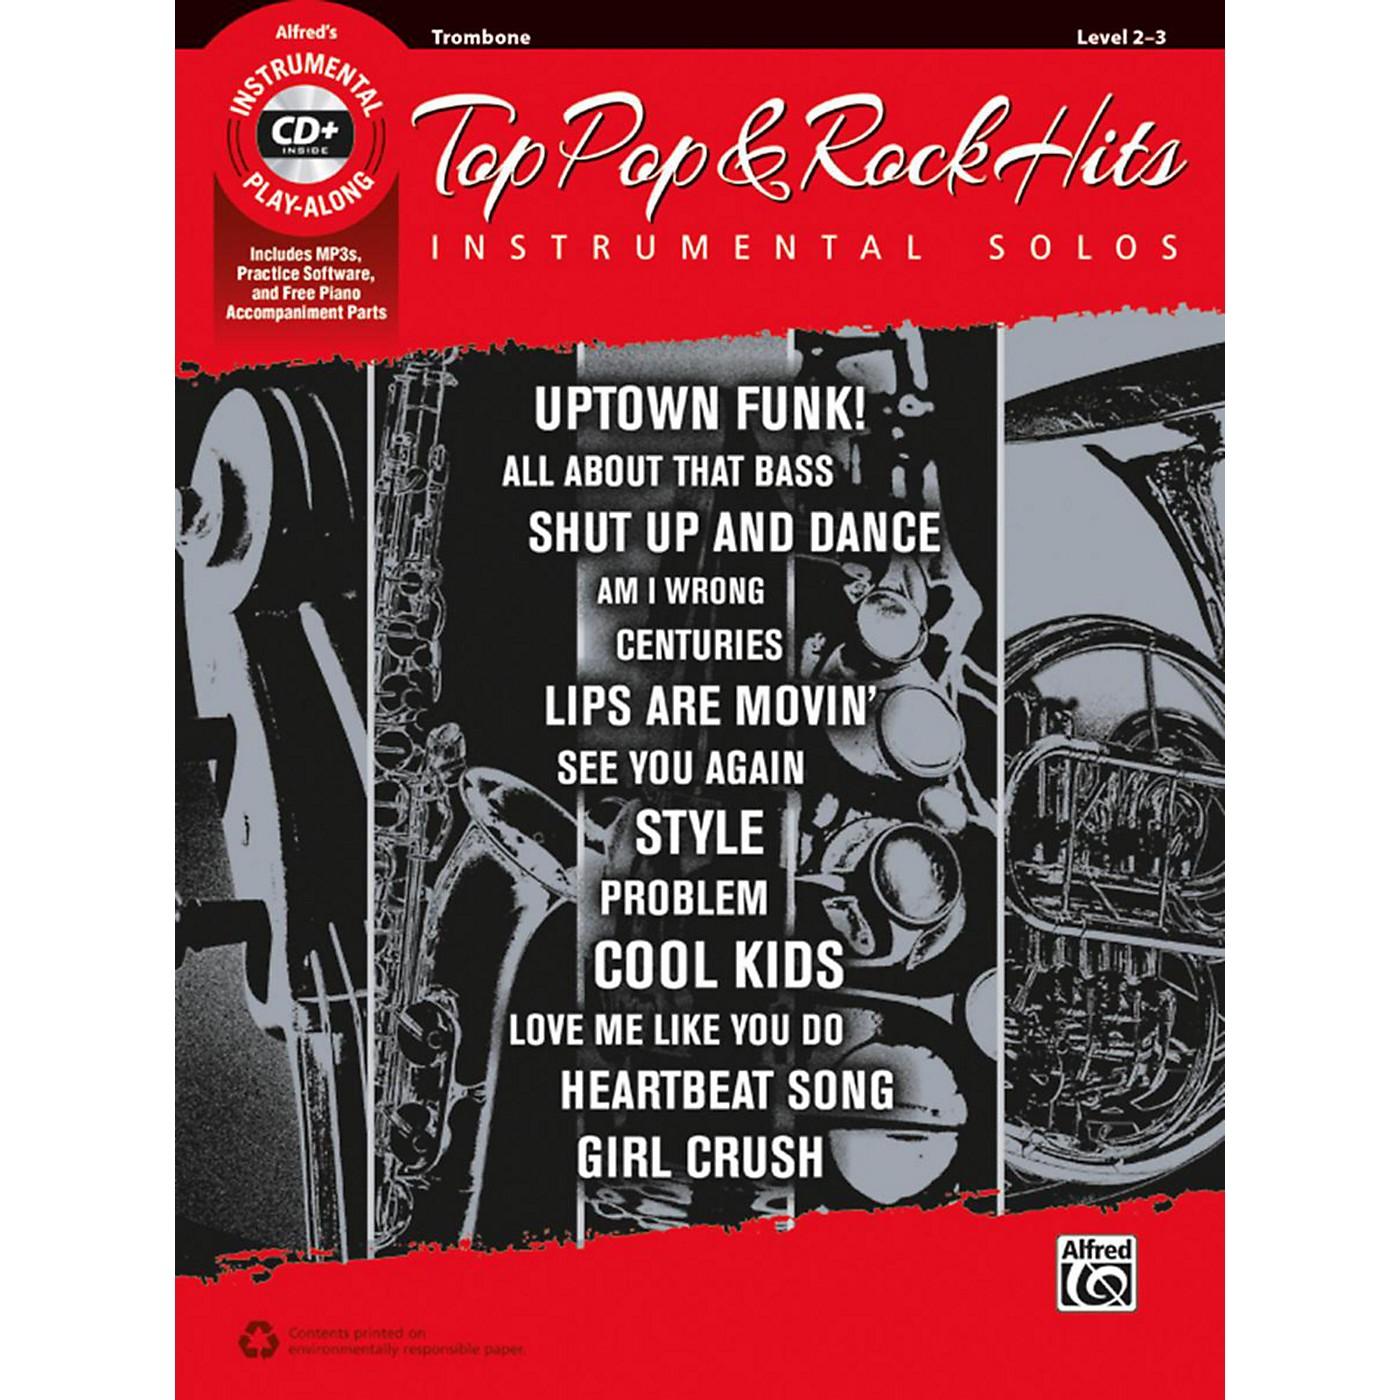 Alfred Top Pop & Rock Hits Instrumental Solos Trombone Book & CD thumbnail